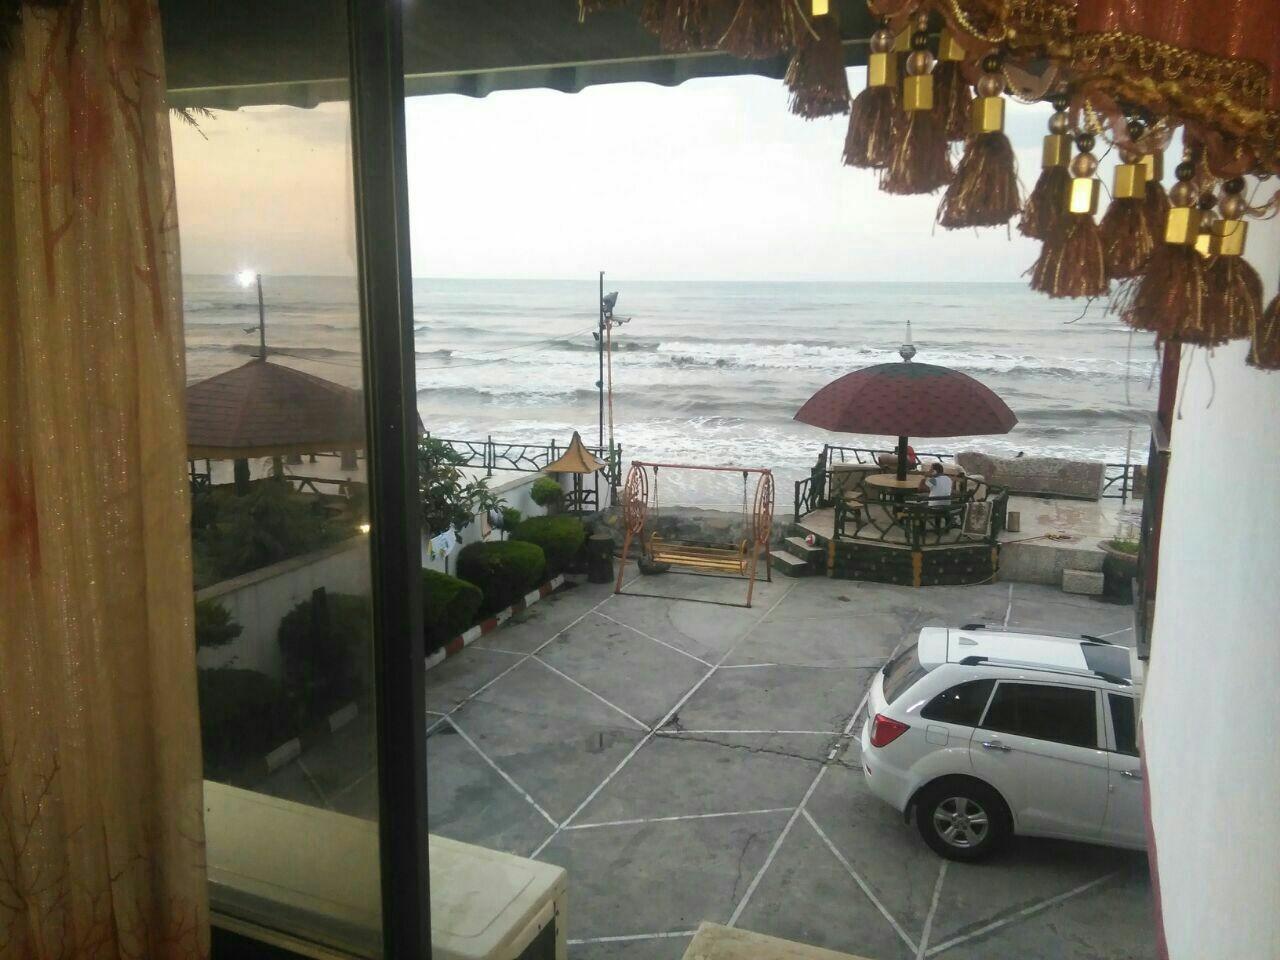 ساحلی ویلا رو به دریا درخط هشت چالوس